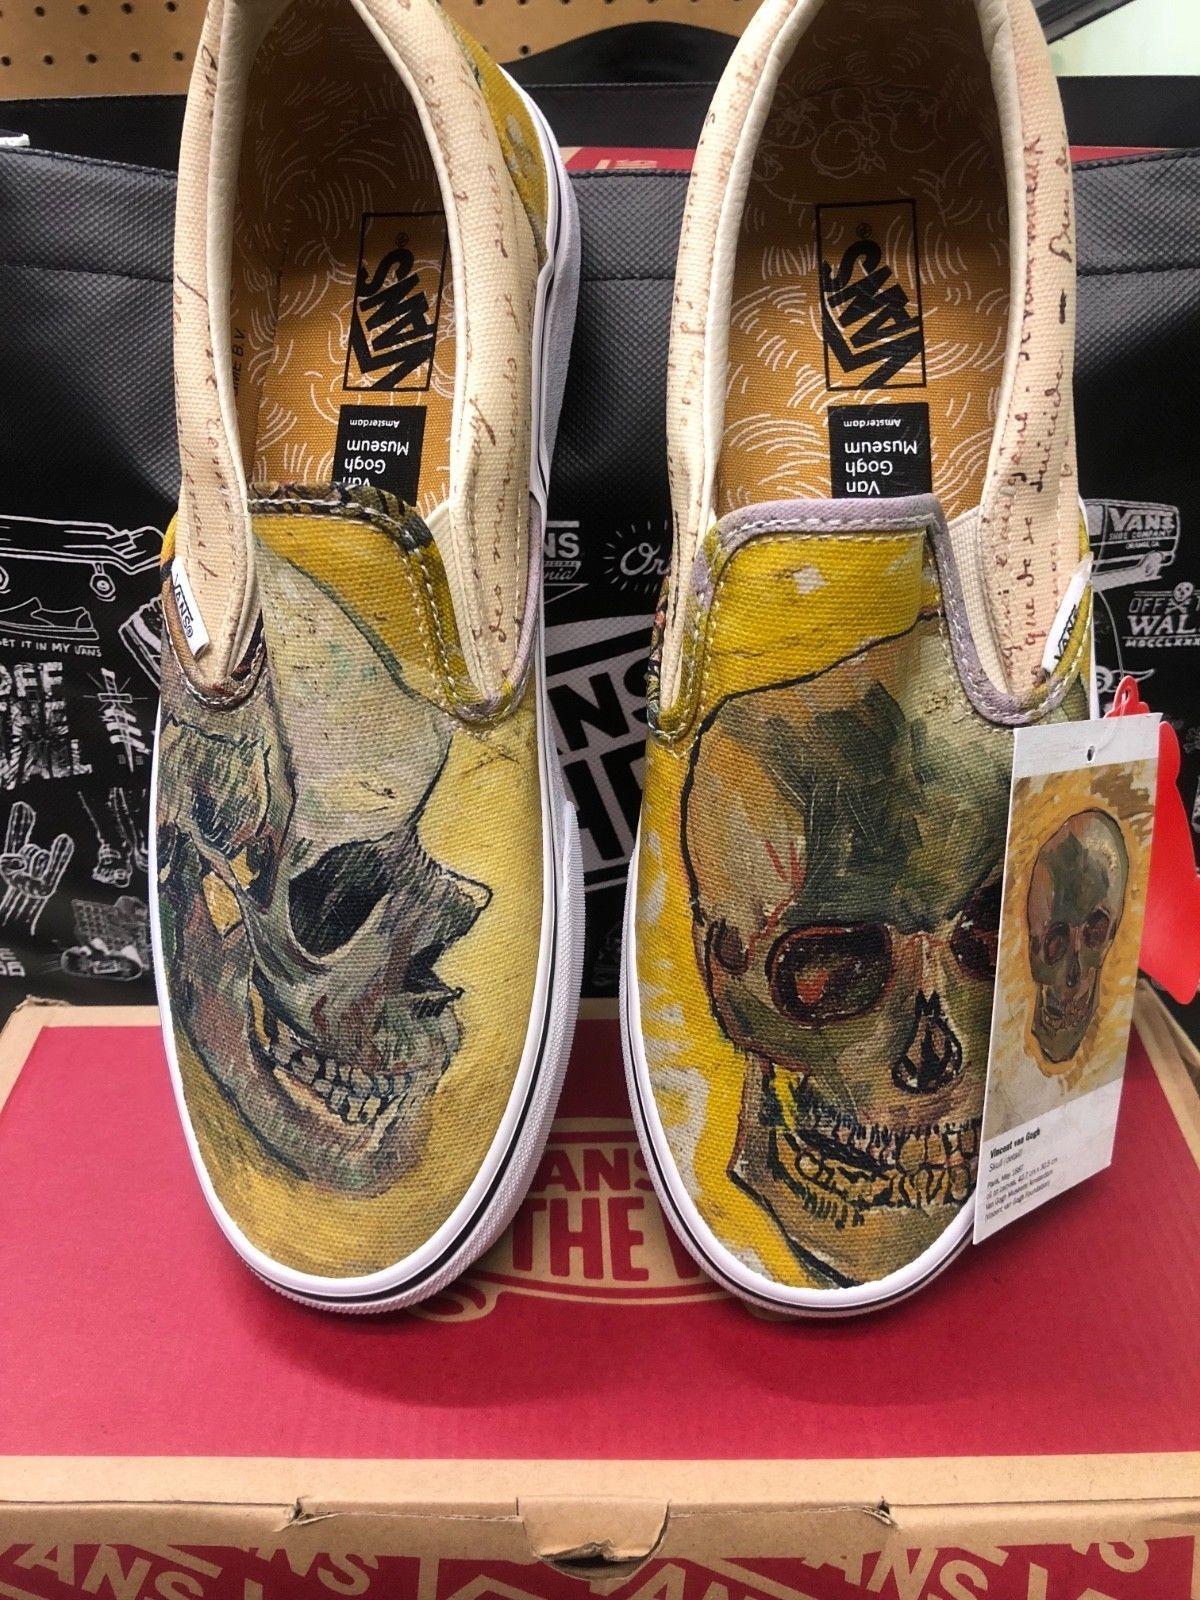 Vincent Van Gogh Skull Vans Classic Slip On 7 5 Men S 9 Women S Vans Classic Vans Vans Classic Slip On